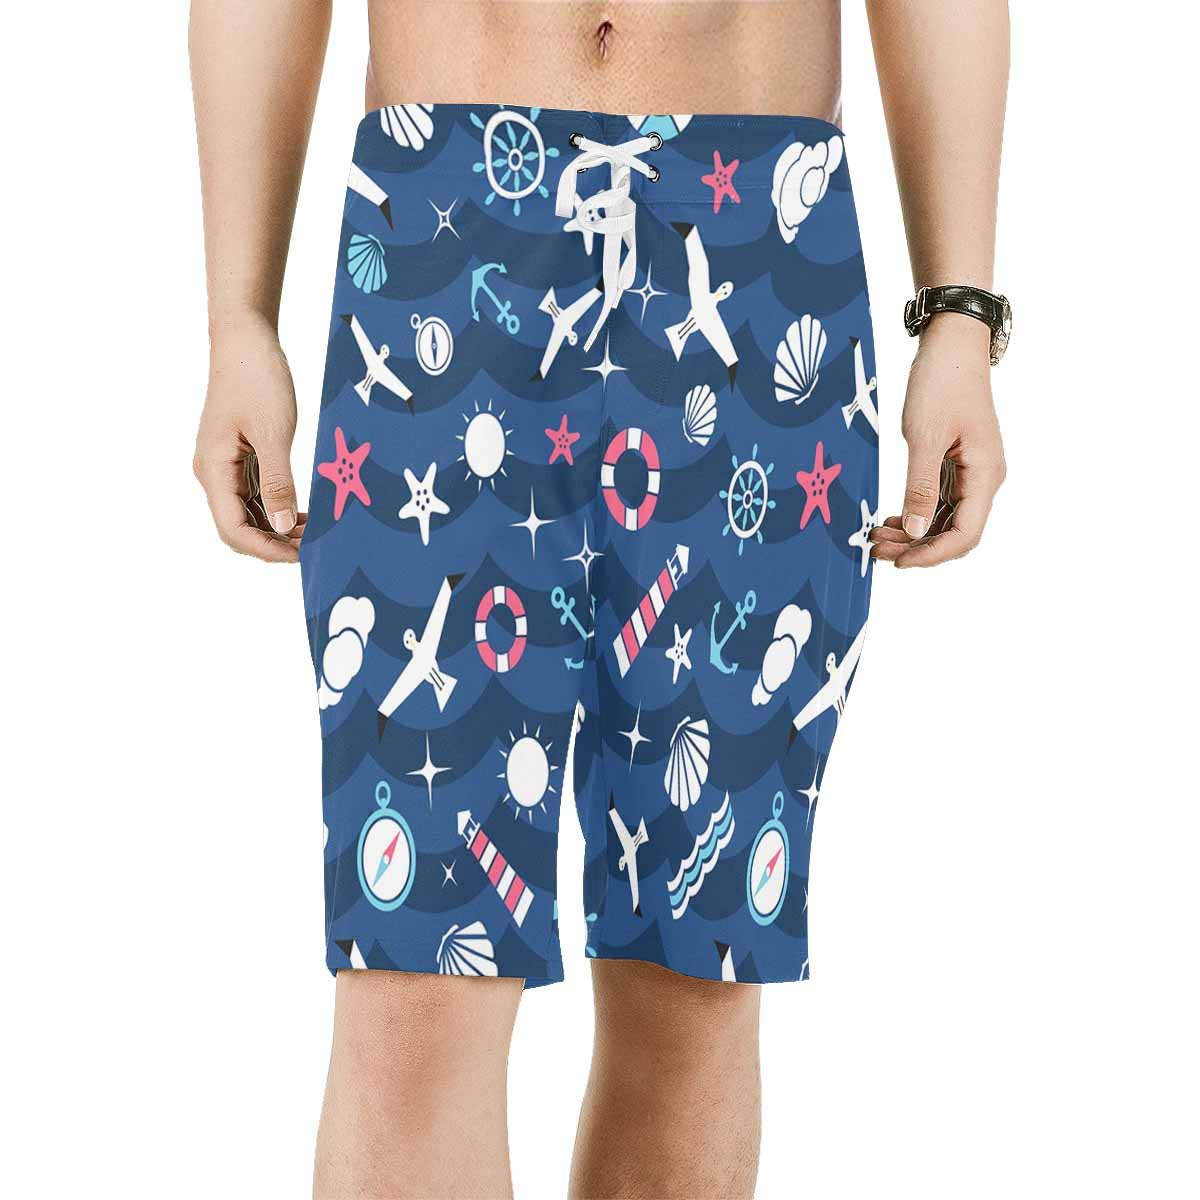 XS-6XL INTERESTPRINT Mens Swim Trunks Quick Dry Anchor Sea Ocean Wave Swimwear Board Shorts